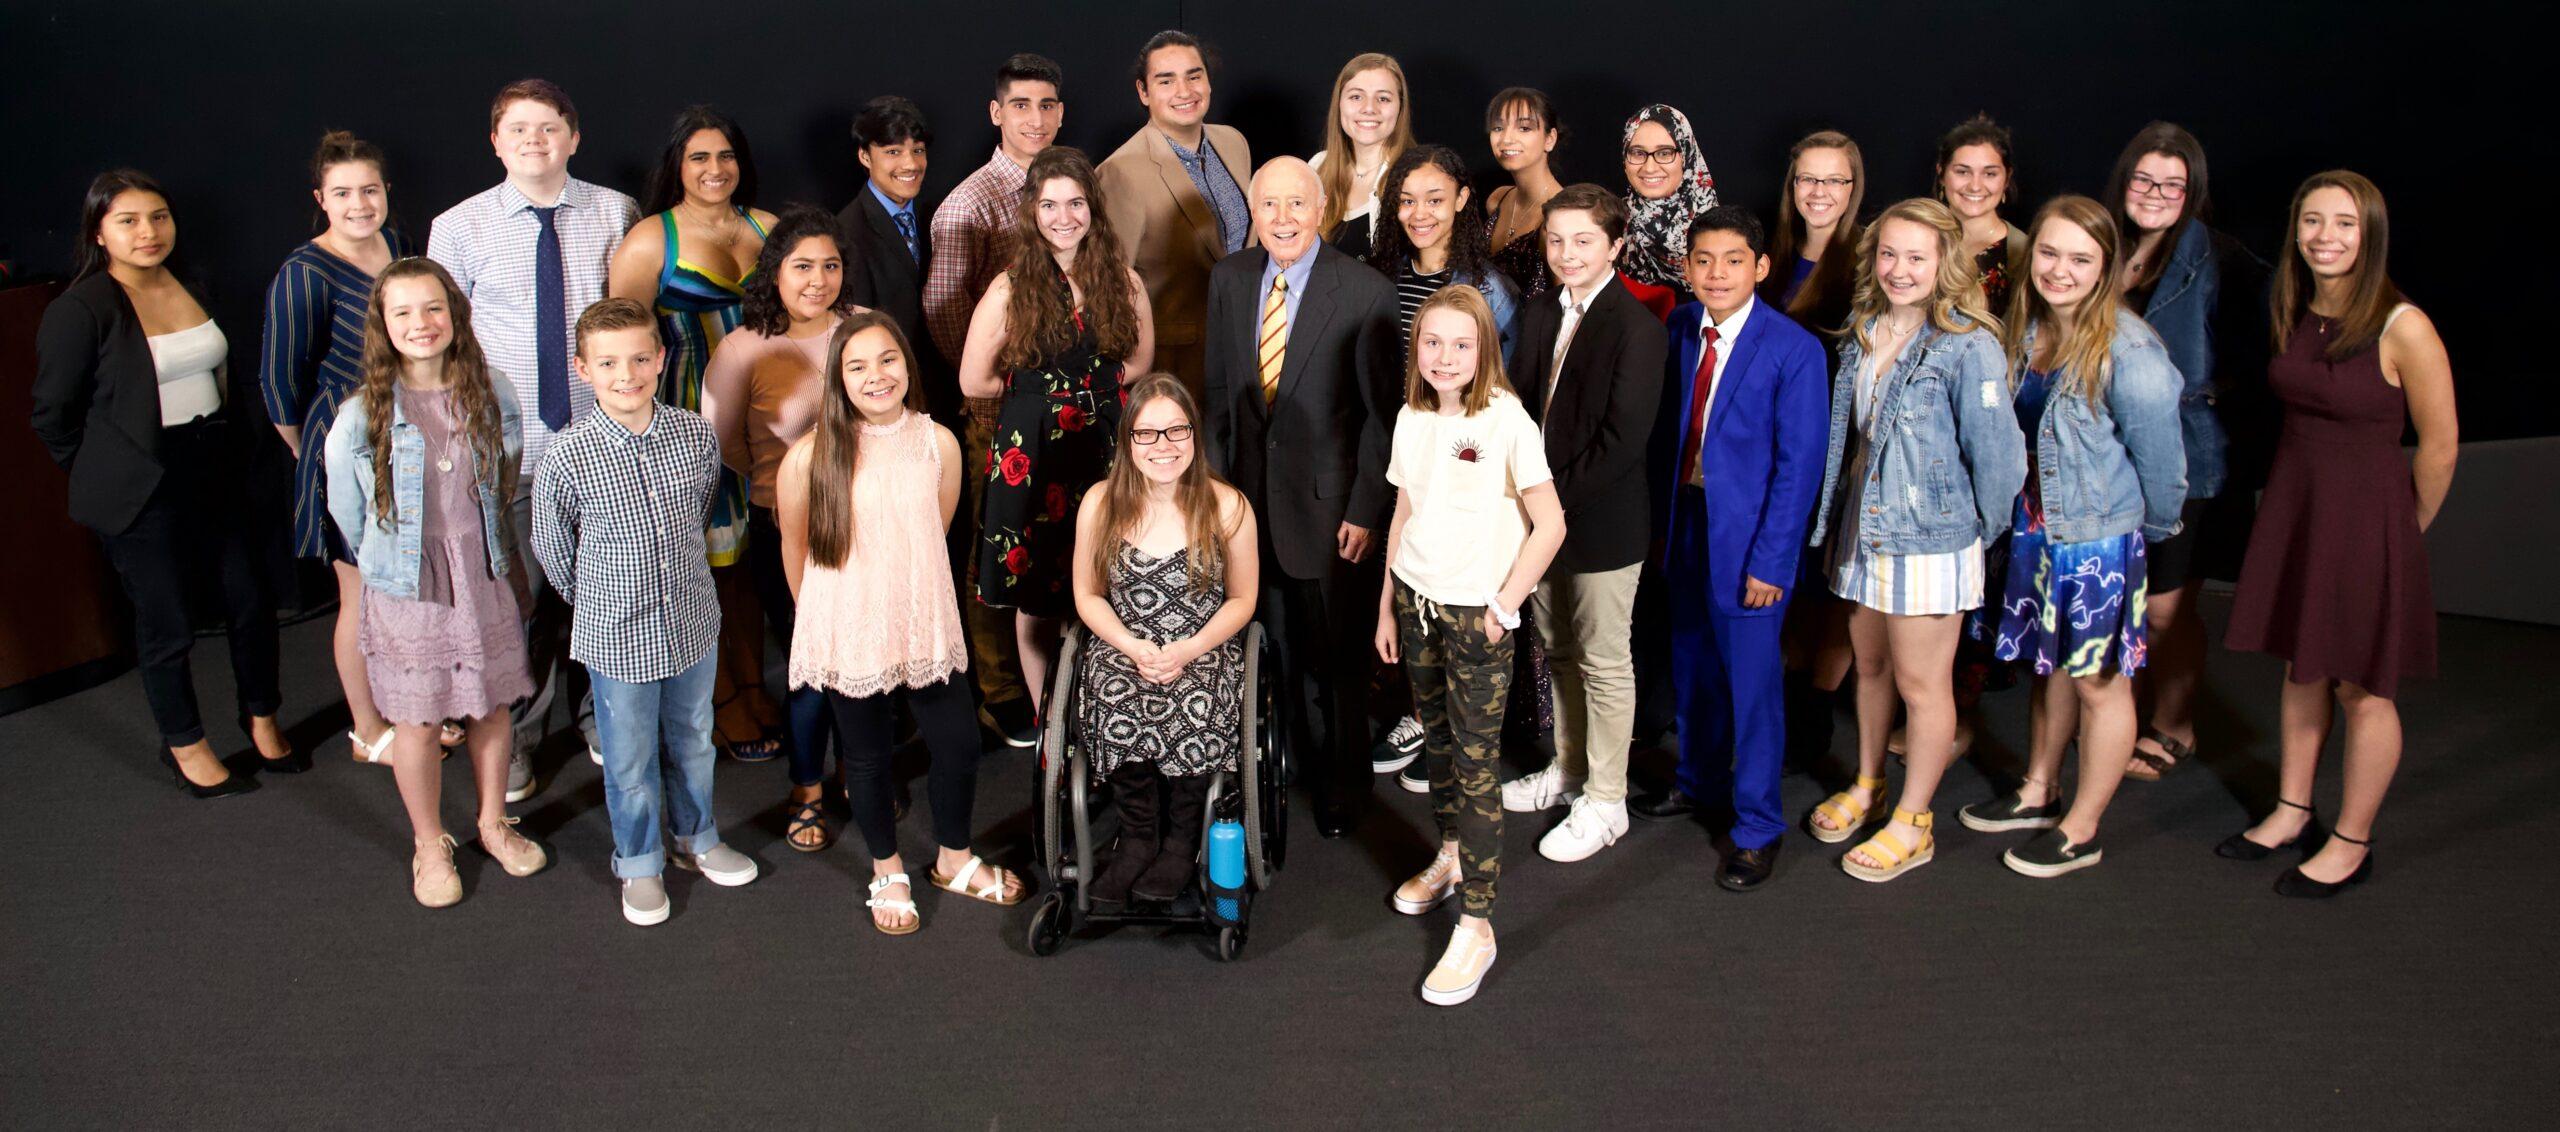 Amazing Kids Group Photo